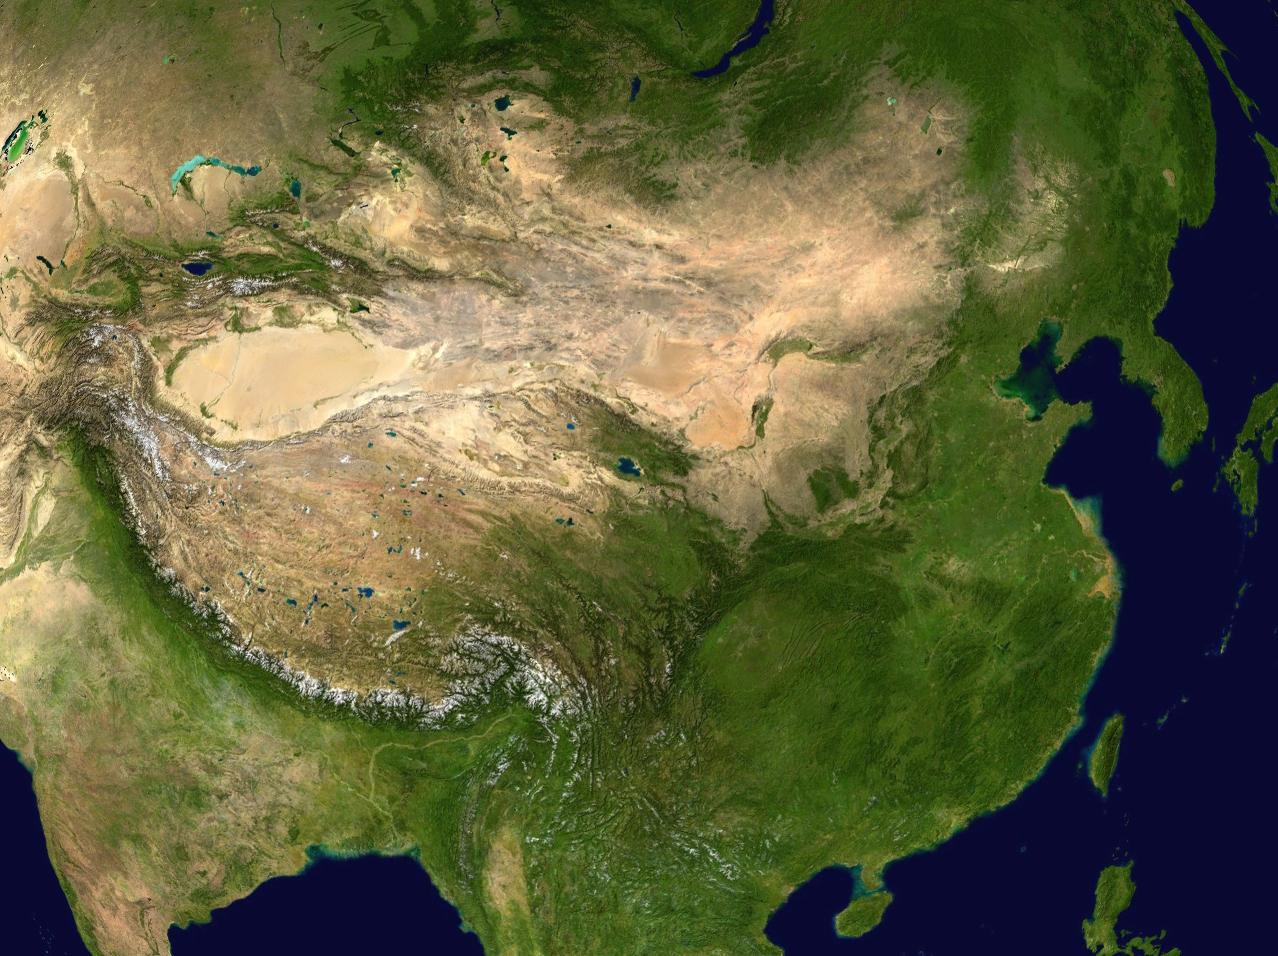 [img]http://upload.wikimedia.org/wikipedia/commons/e/ea/China_satellite.png[/img]